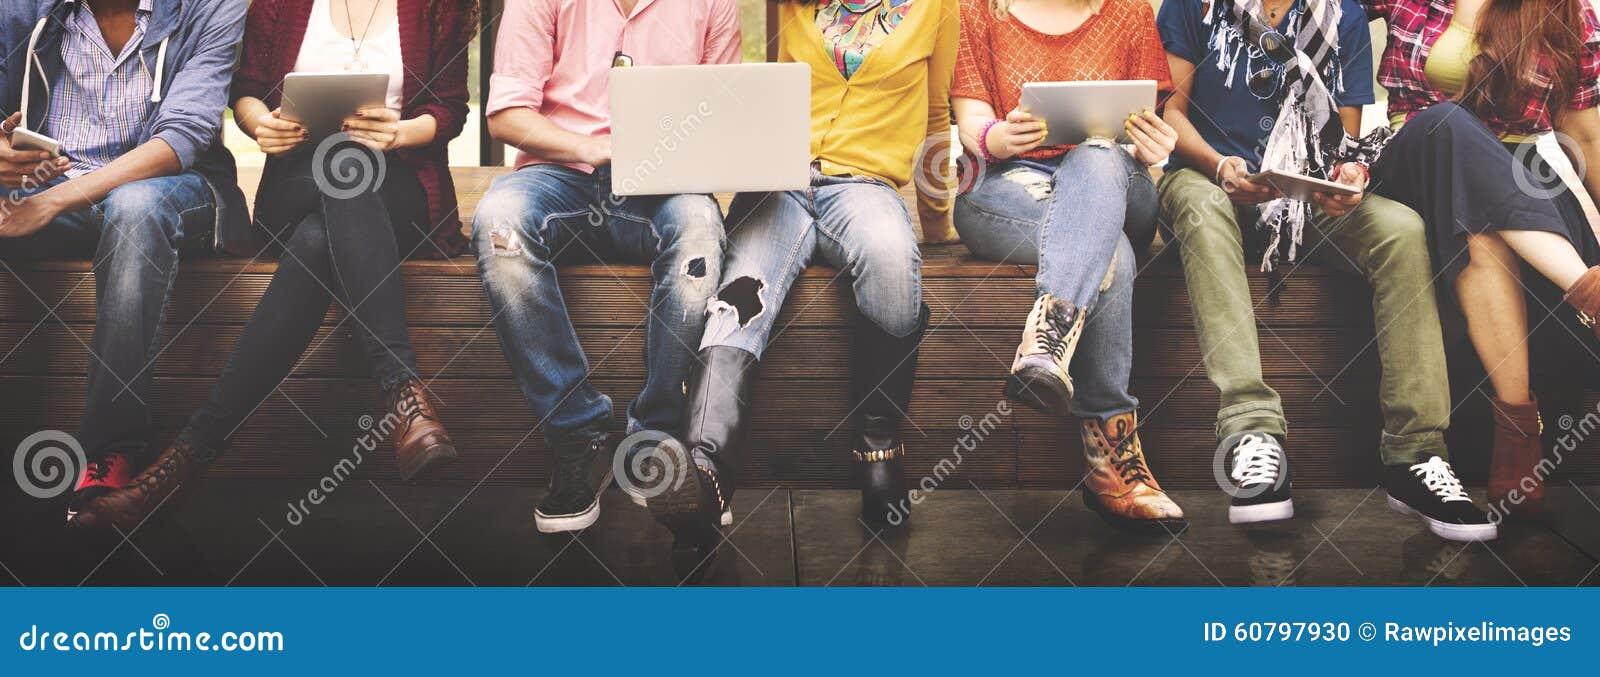 Jeunes Team Together Cheerful Concept d adolescents